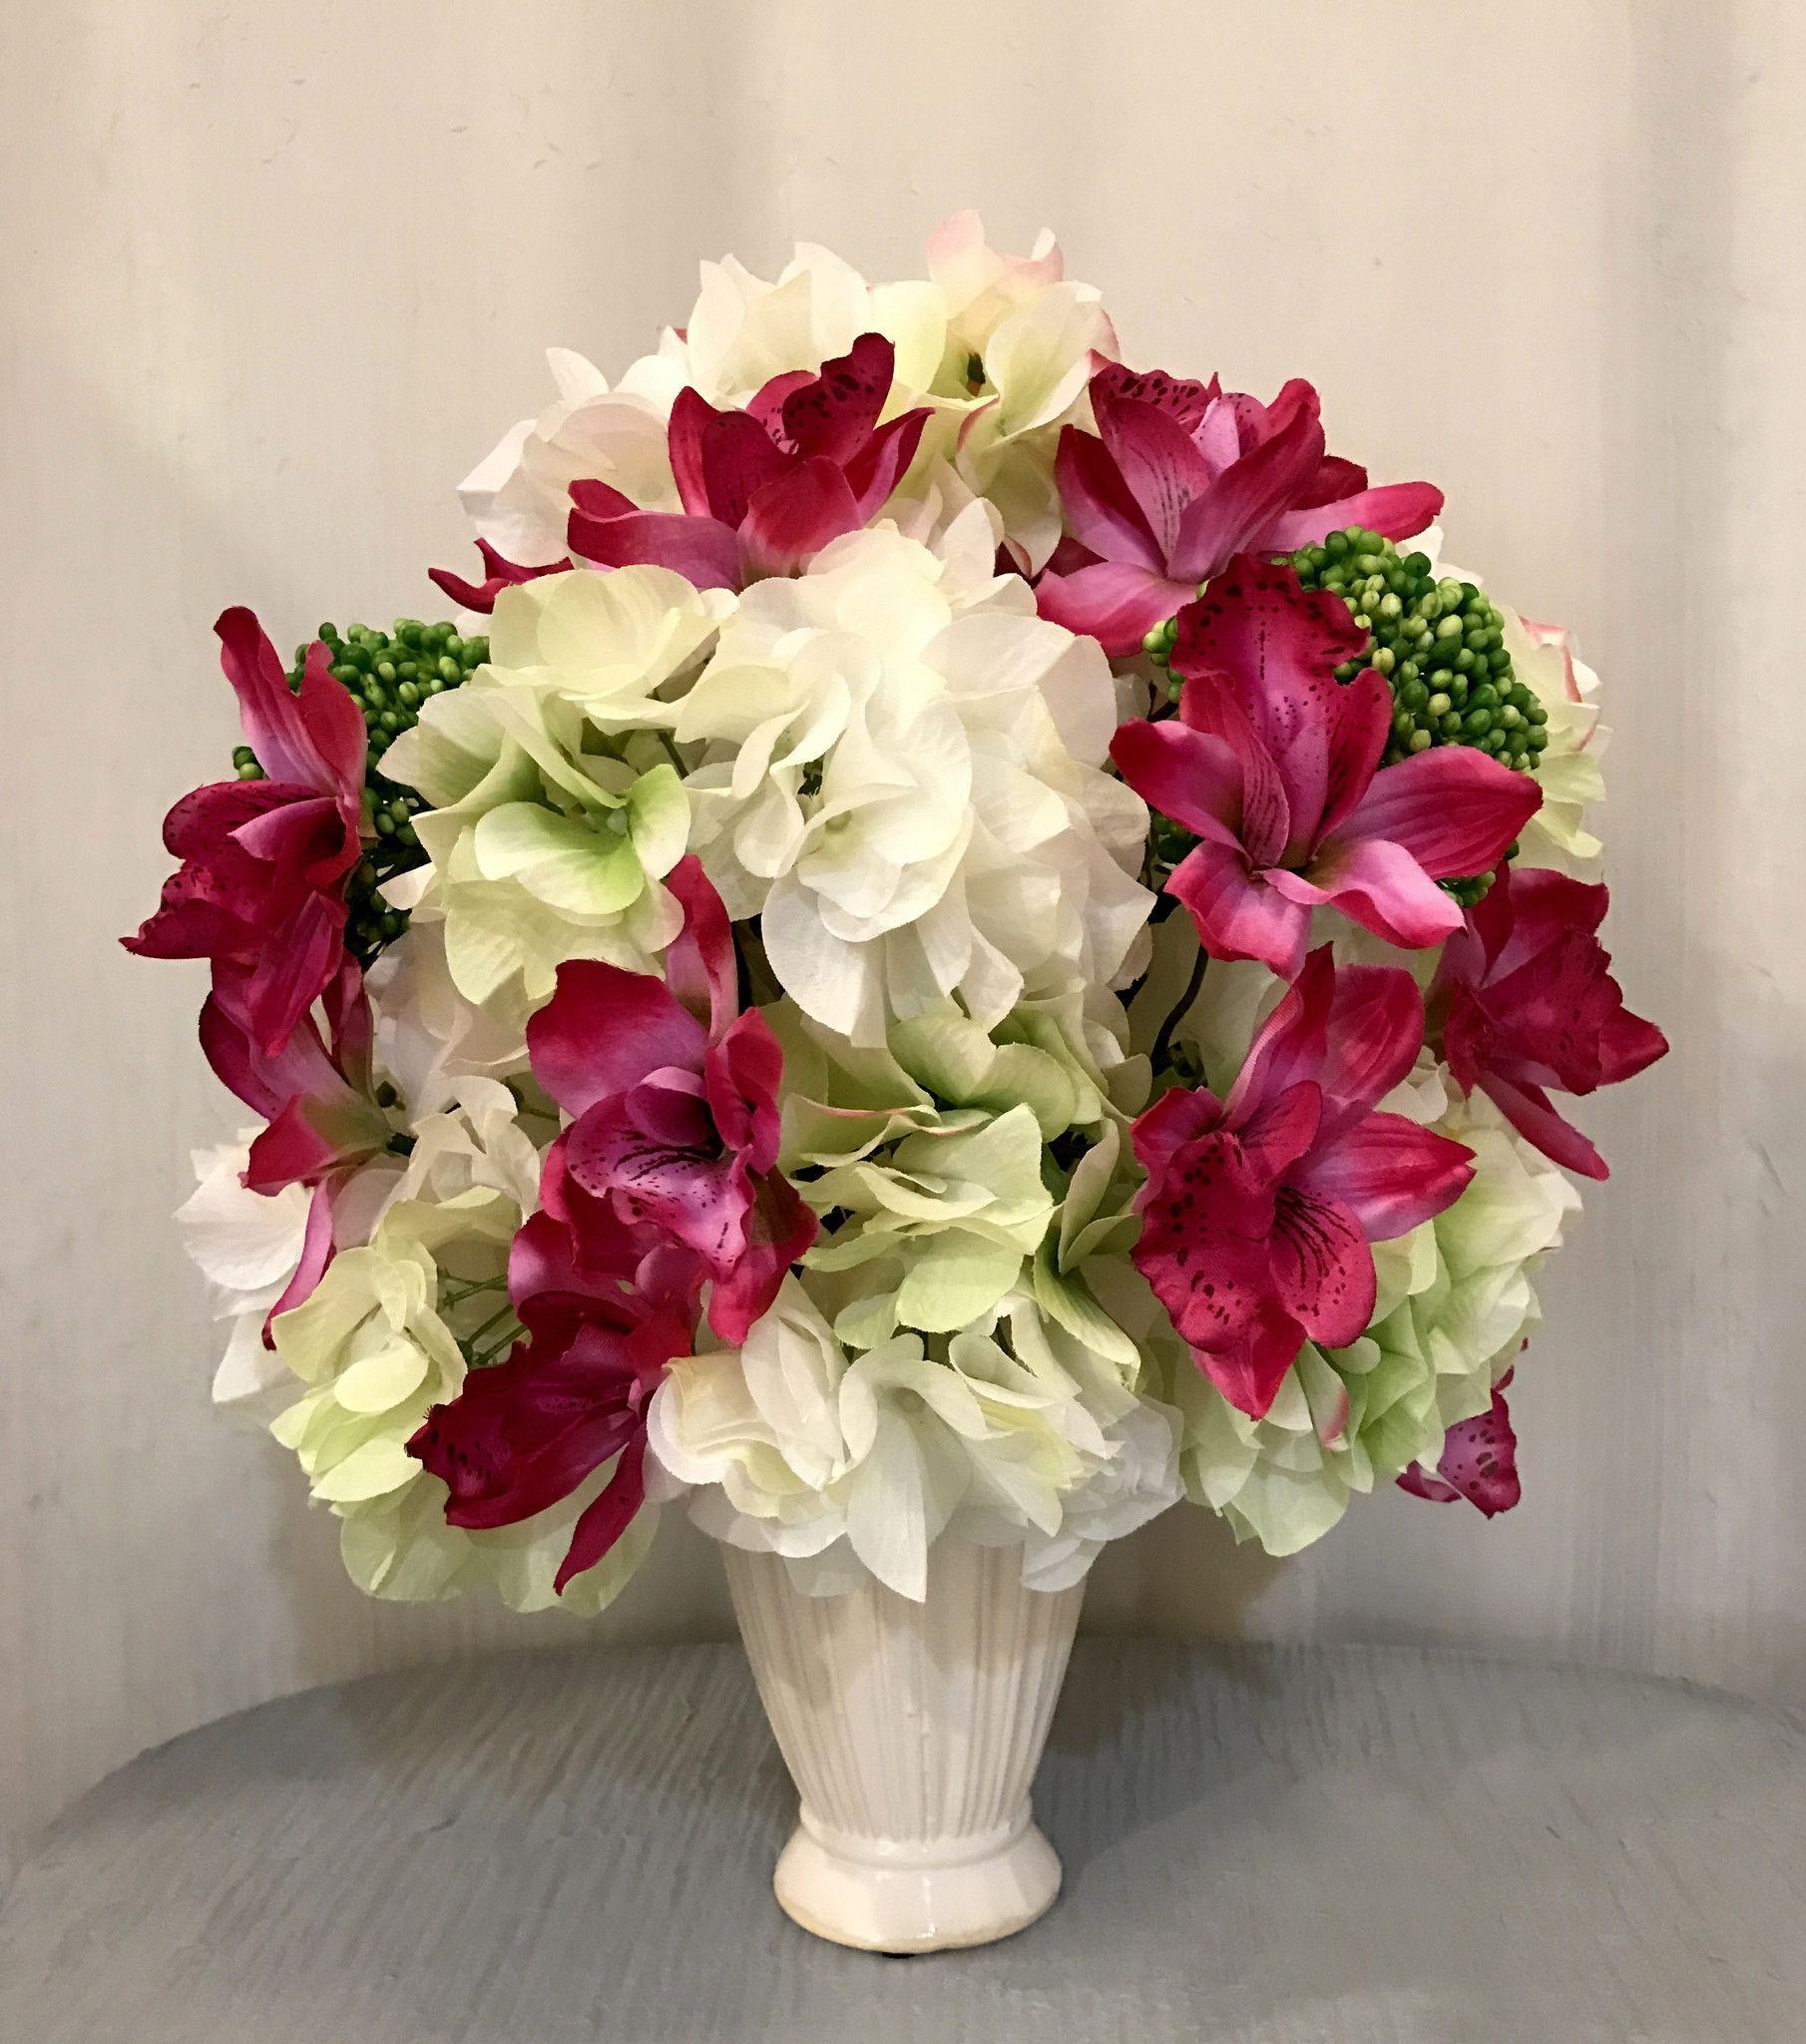 Cymbidium orchid hydrangea and sedum plant arrangement in cream cymbidium orchid hydrangea and sedum plant arrangement in cream ceramic vase orchid and white reviewsmspy